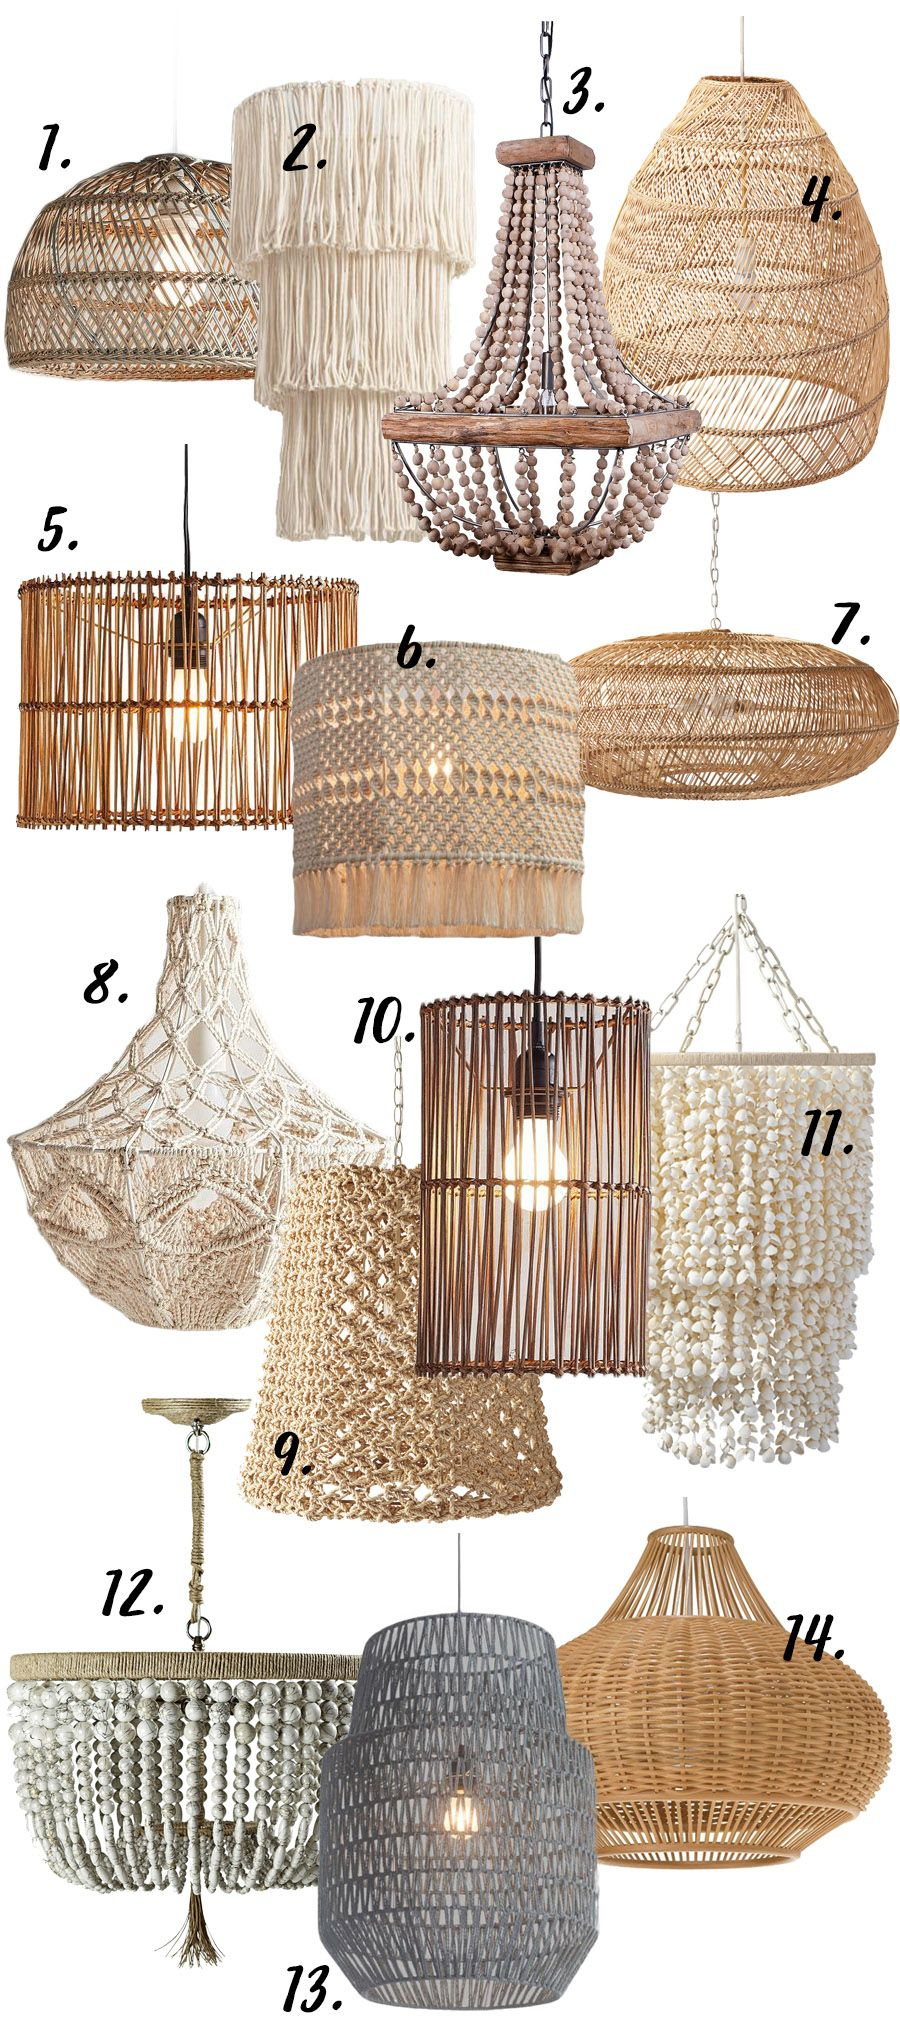 Modern Boho Chandeliers & Pendant Lights 30+ Chic Options